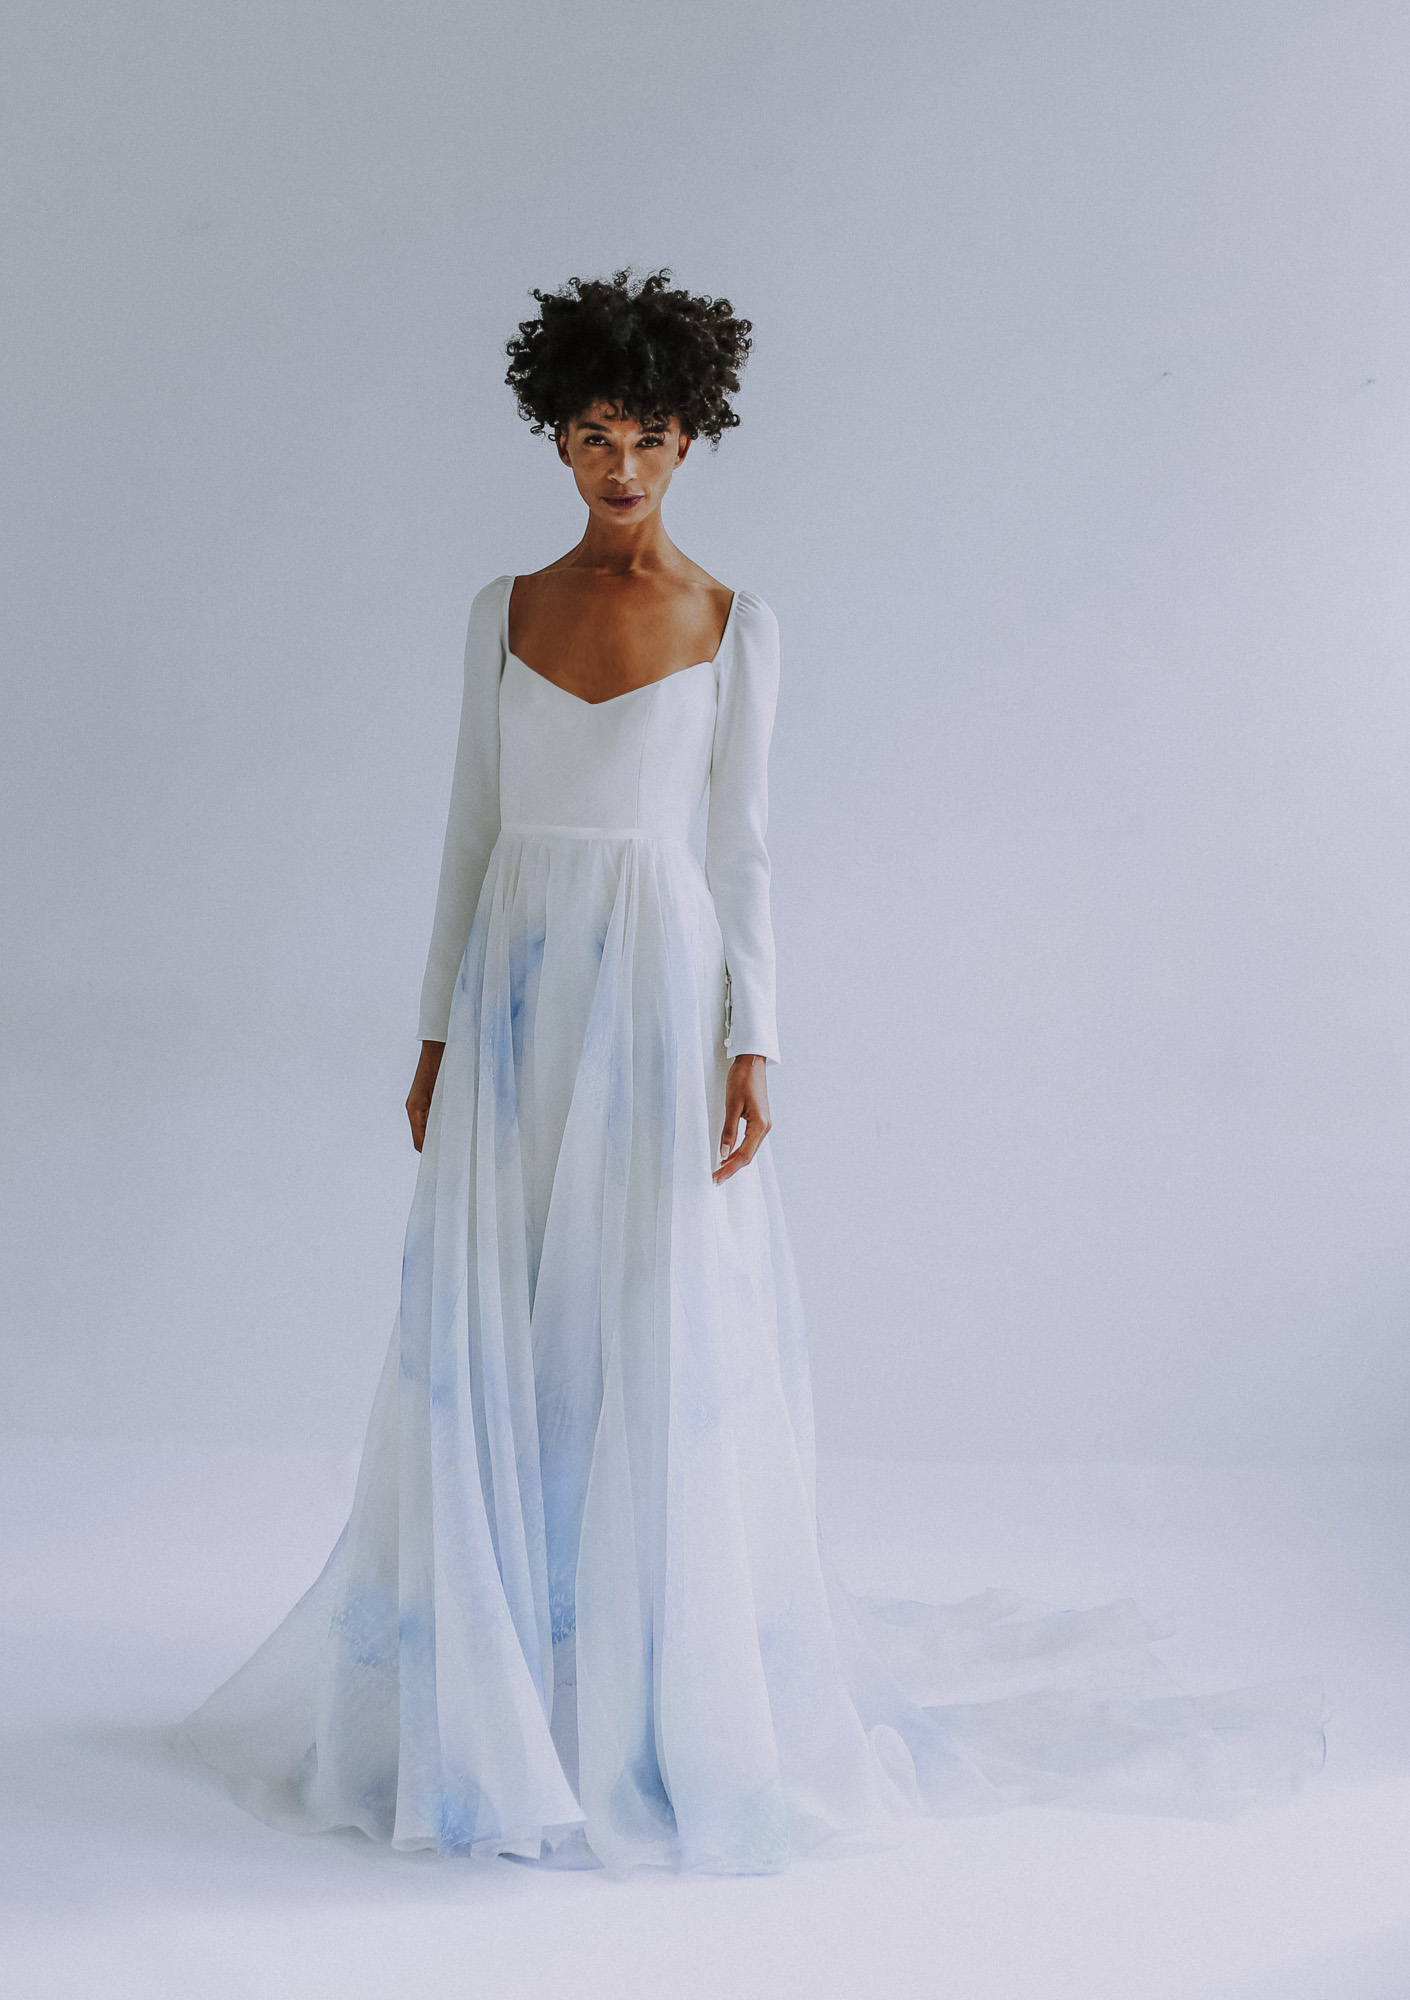 leanne-marshall-wedding-gown-11.jpg